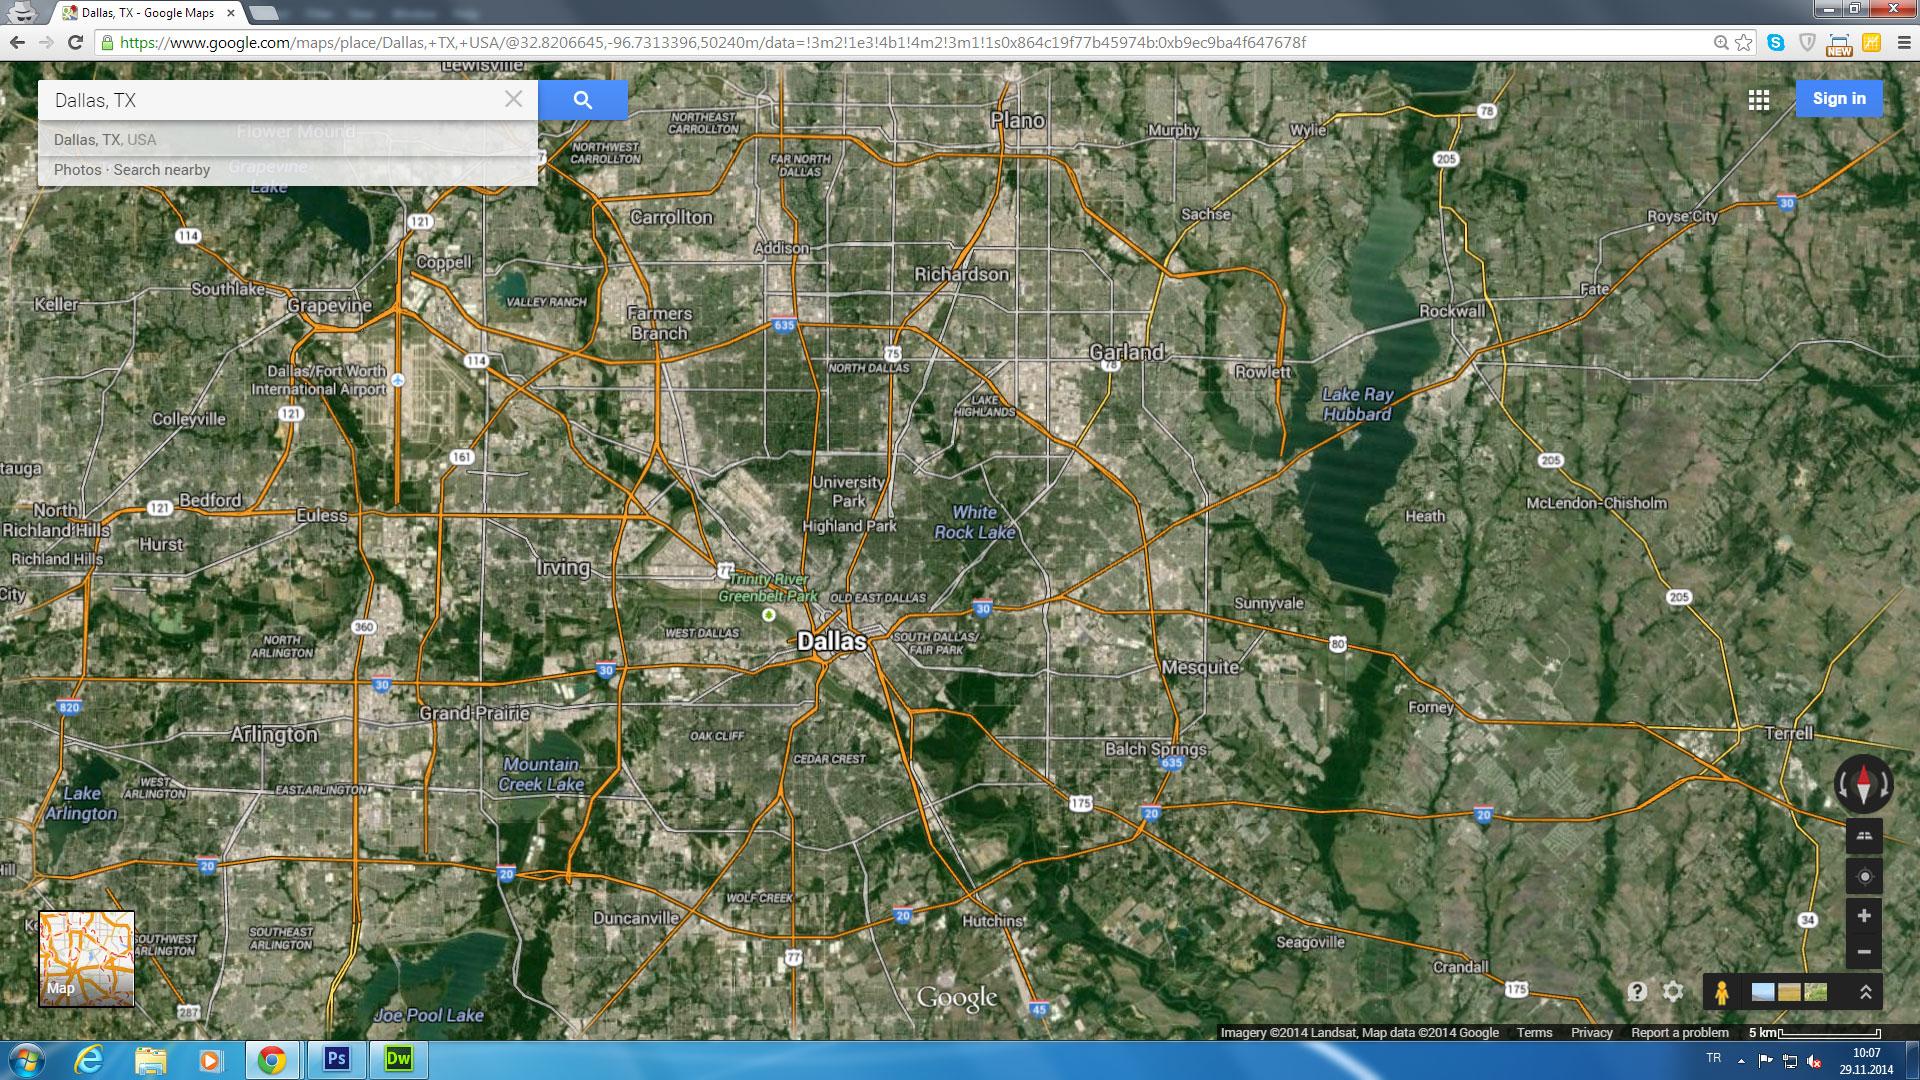 Dallas Texas Google Maps And Travel Information | Download Free - Google Maps Dallas Texas